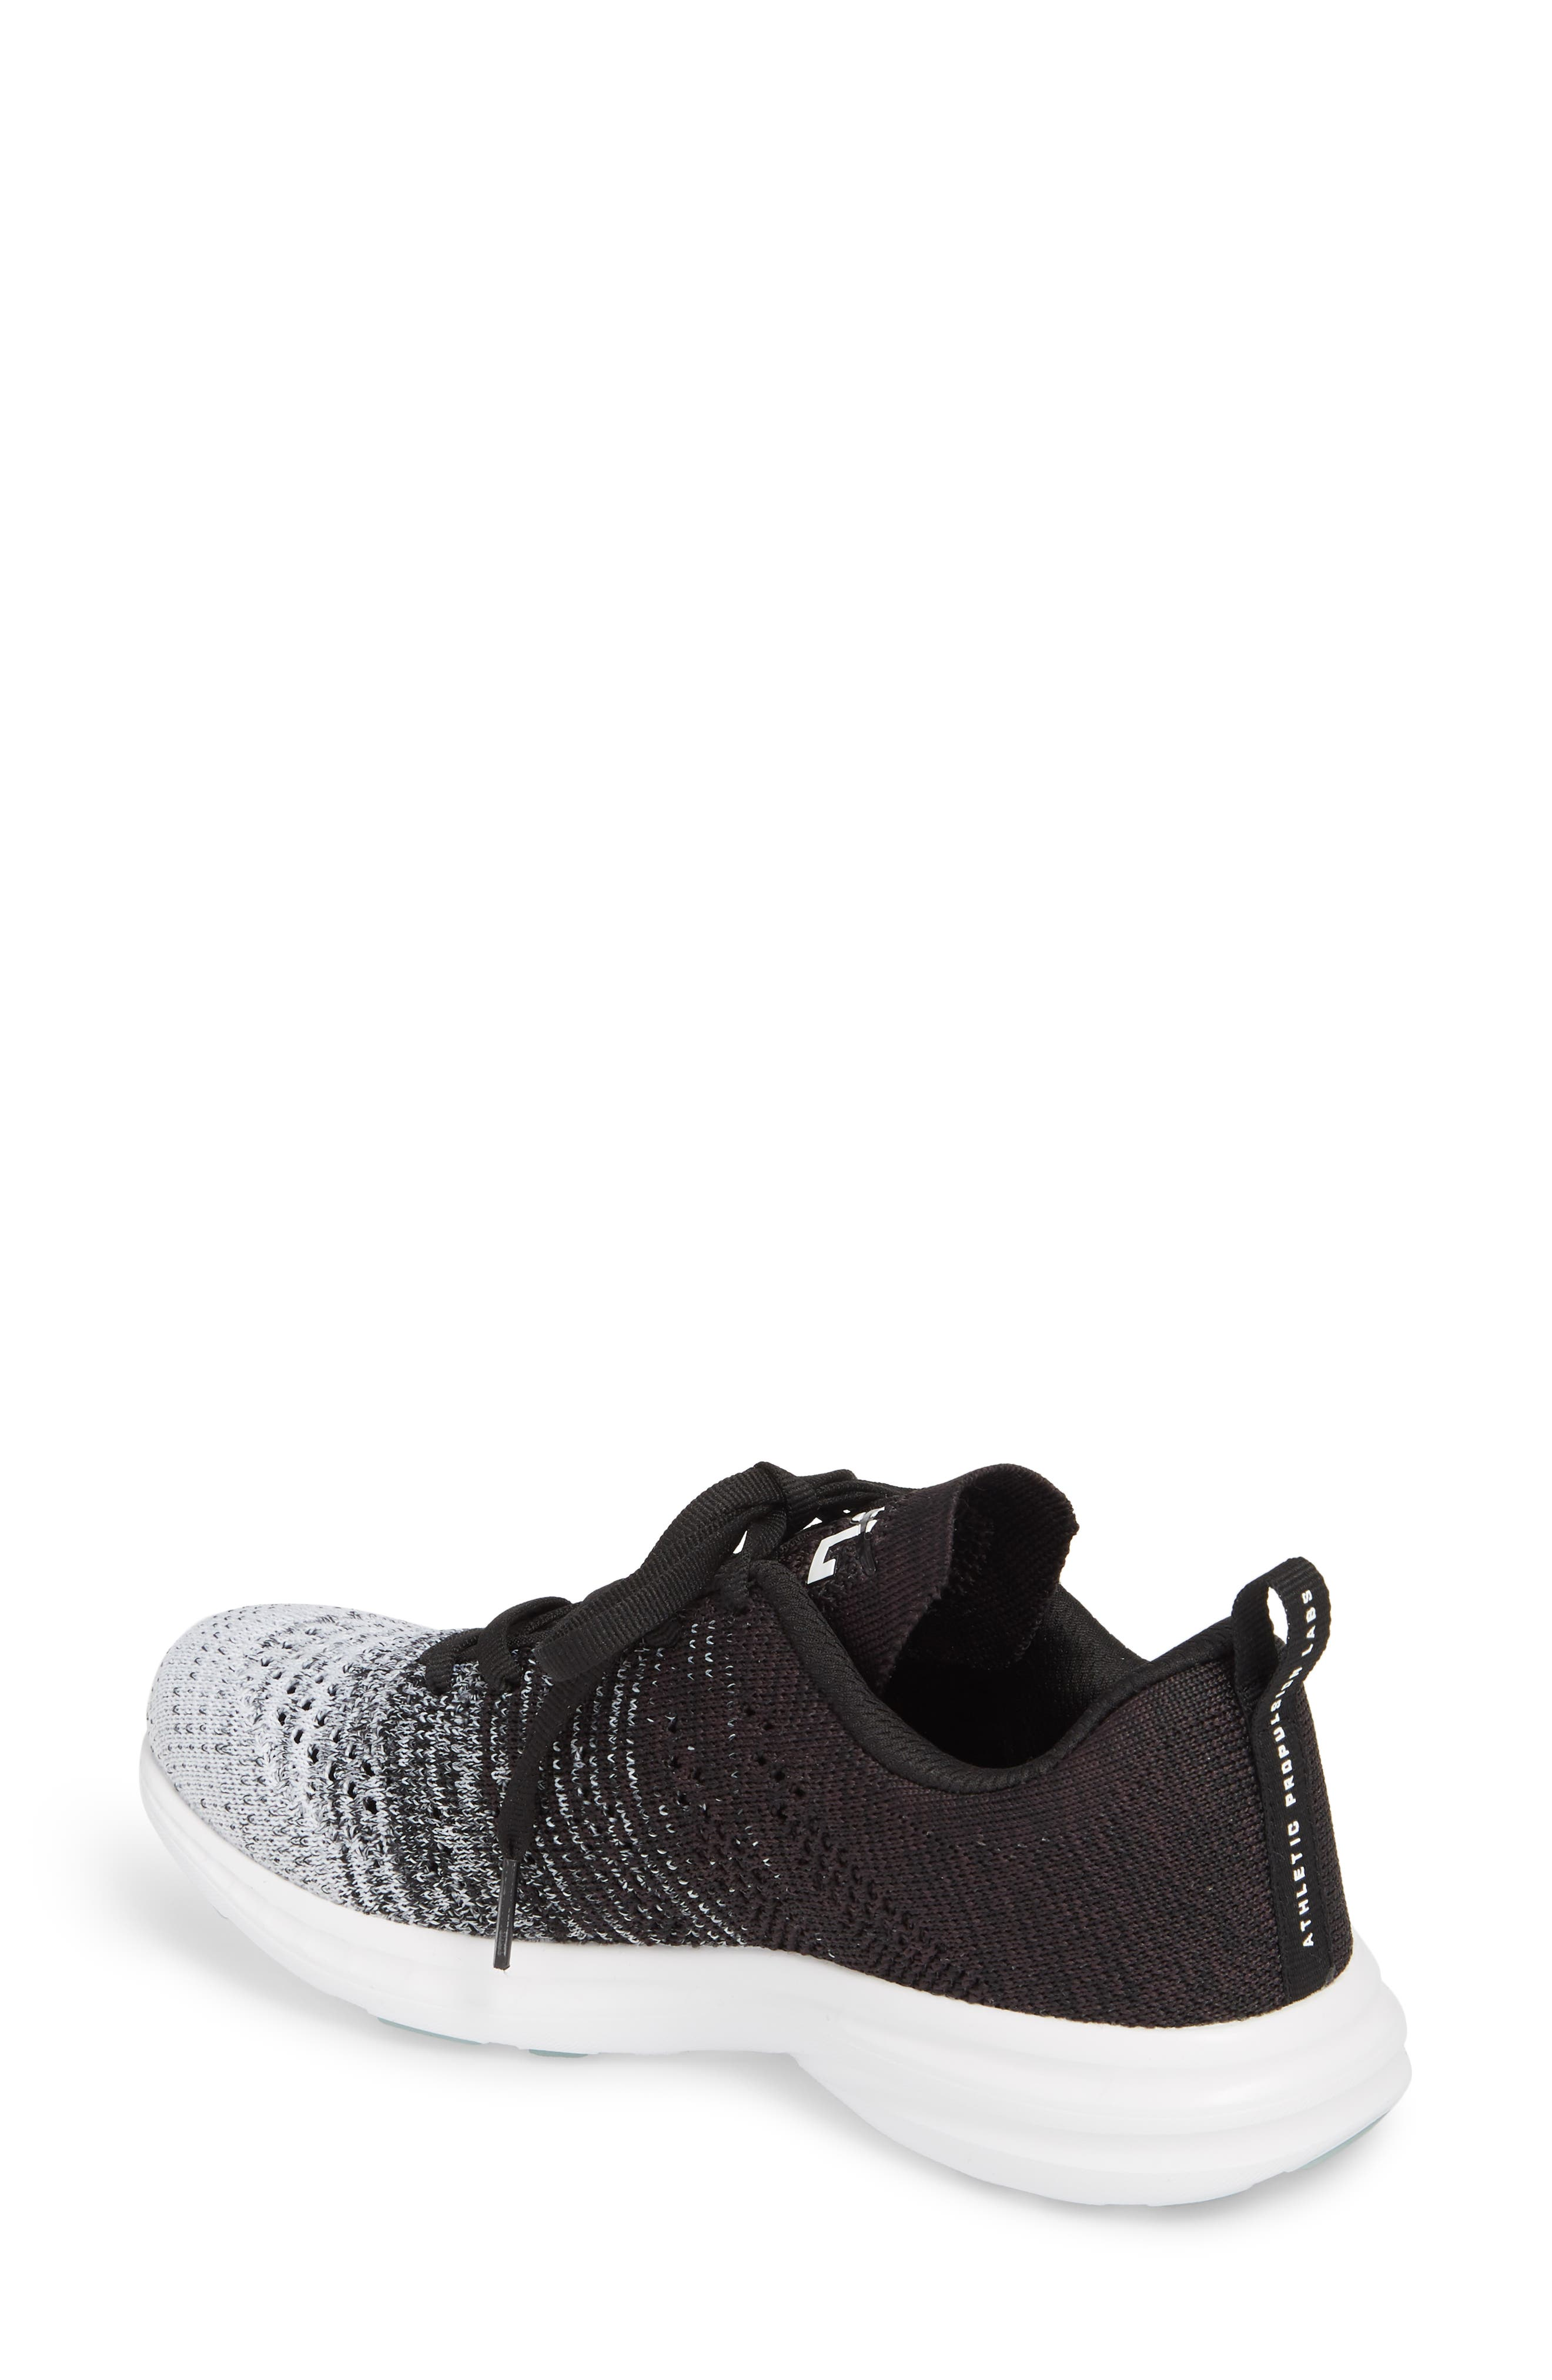 'Techloom Pro' Running Shoe,                             Alternate thumbnail 2, color,                             WHITE/ HEATHER GREY/ BLACK